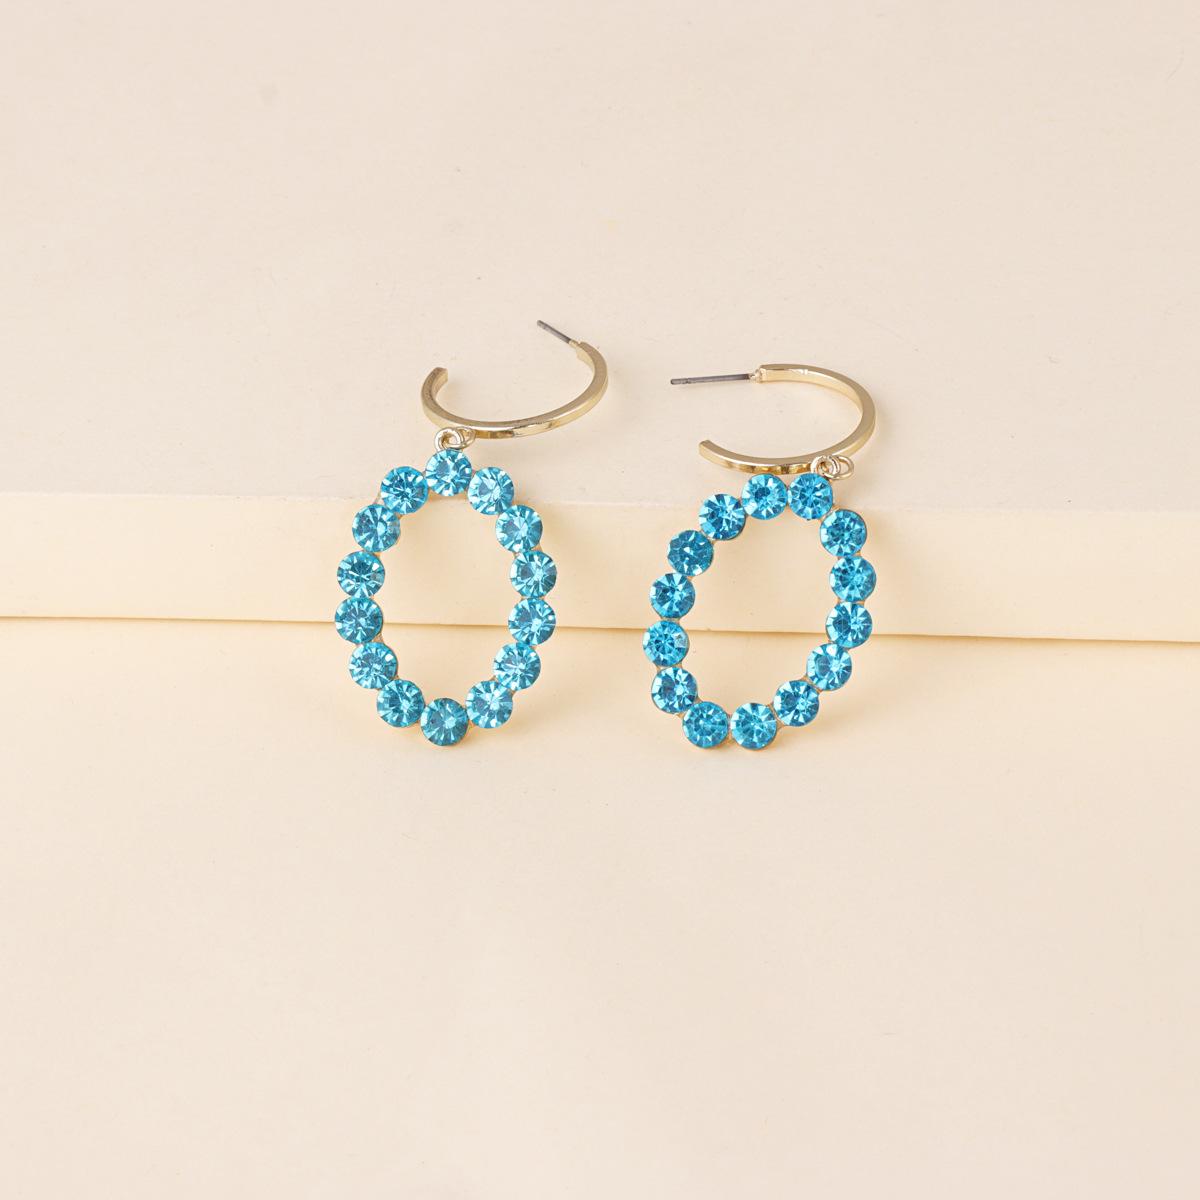 Korean new fashion wild full diamond oval artificial water geometric star earrings  NHJJ261699